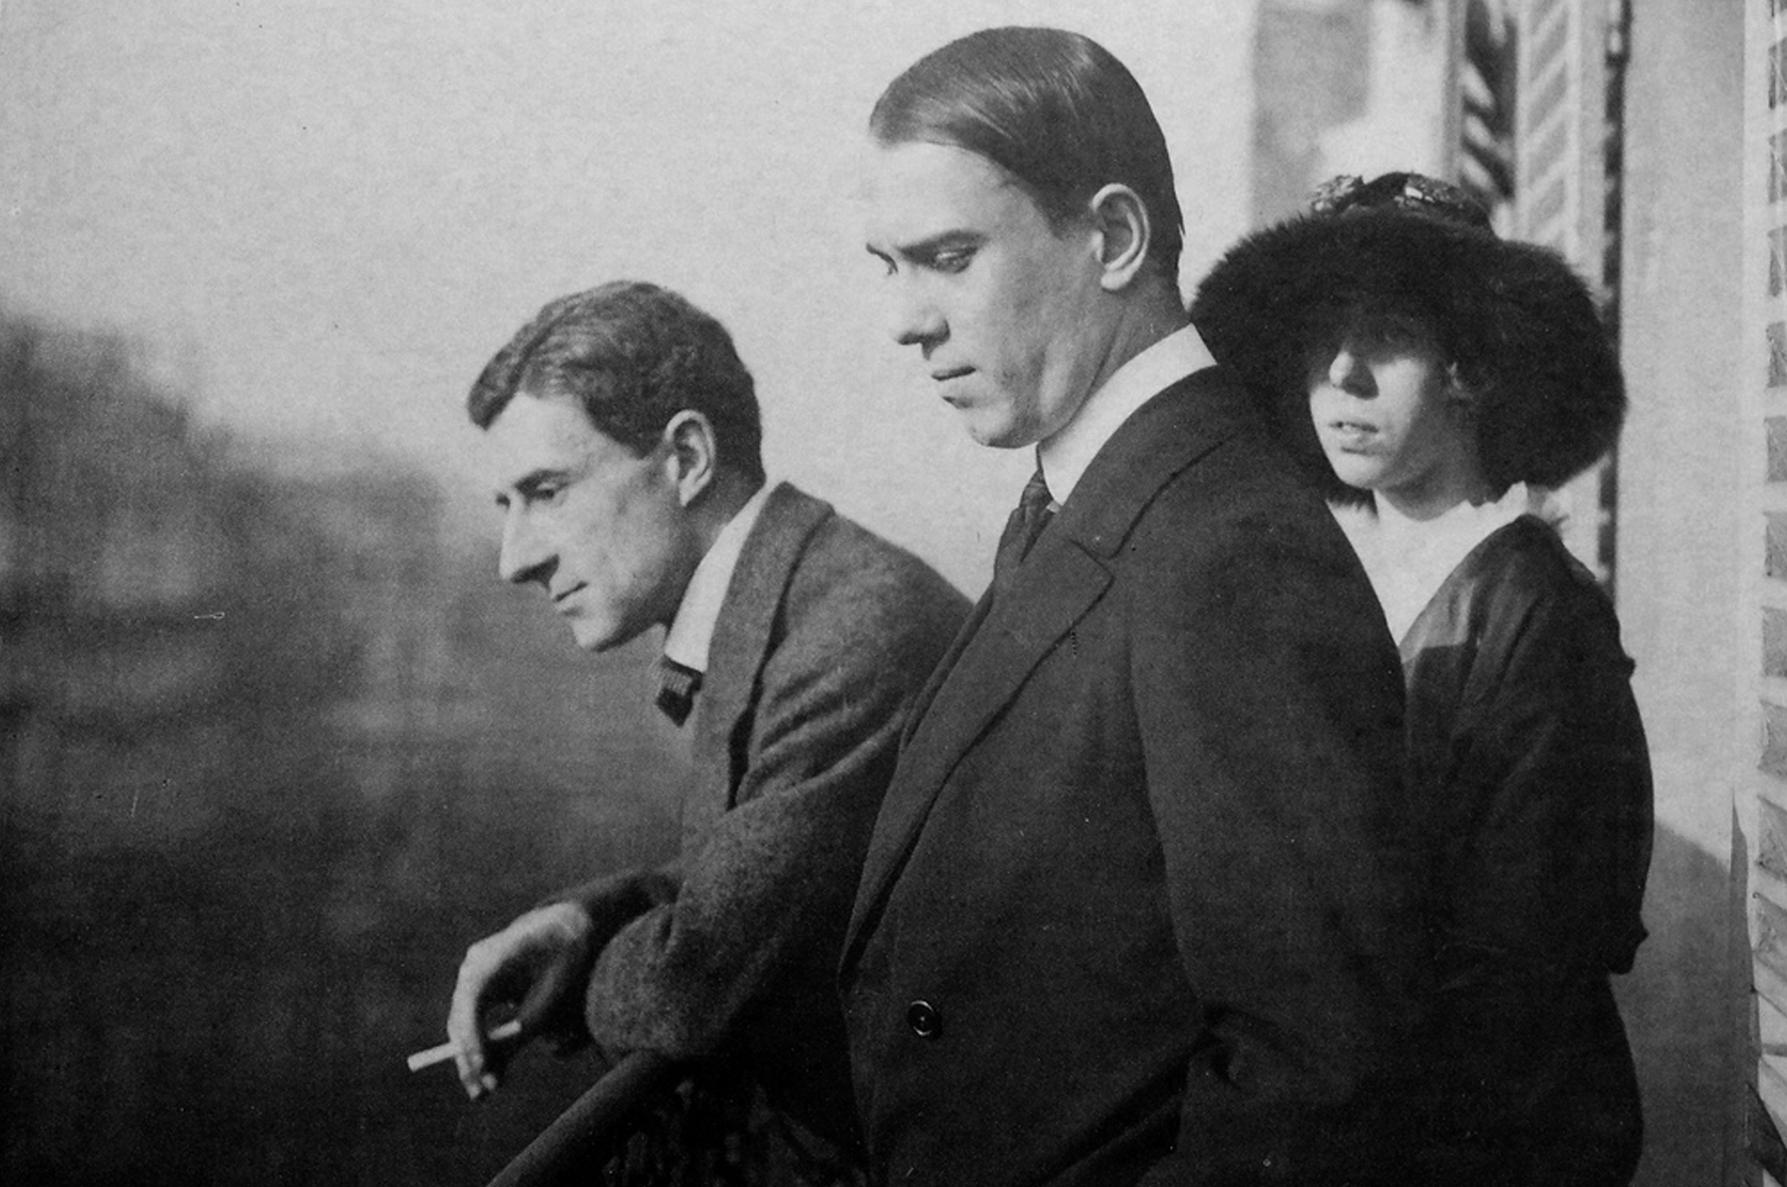 Морис Равель, Вацлав и Бронислава Нижинские. Париж, 1914.